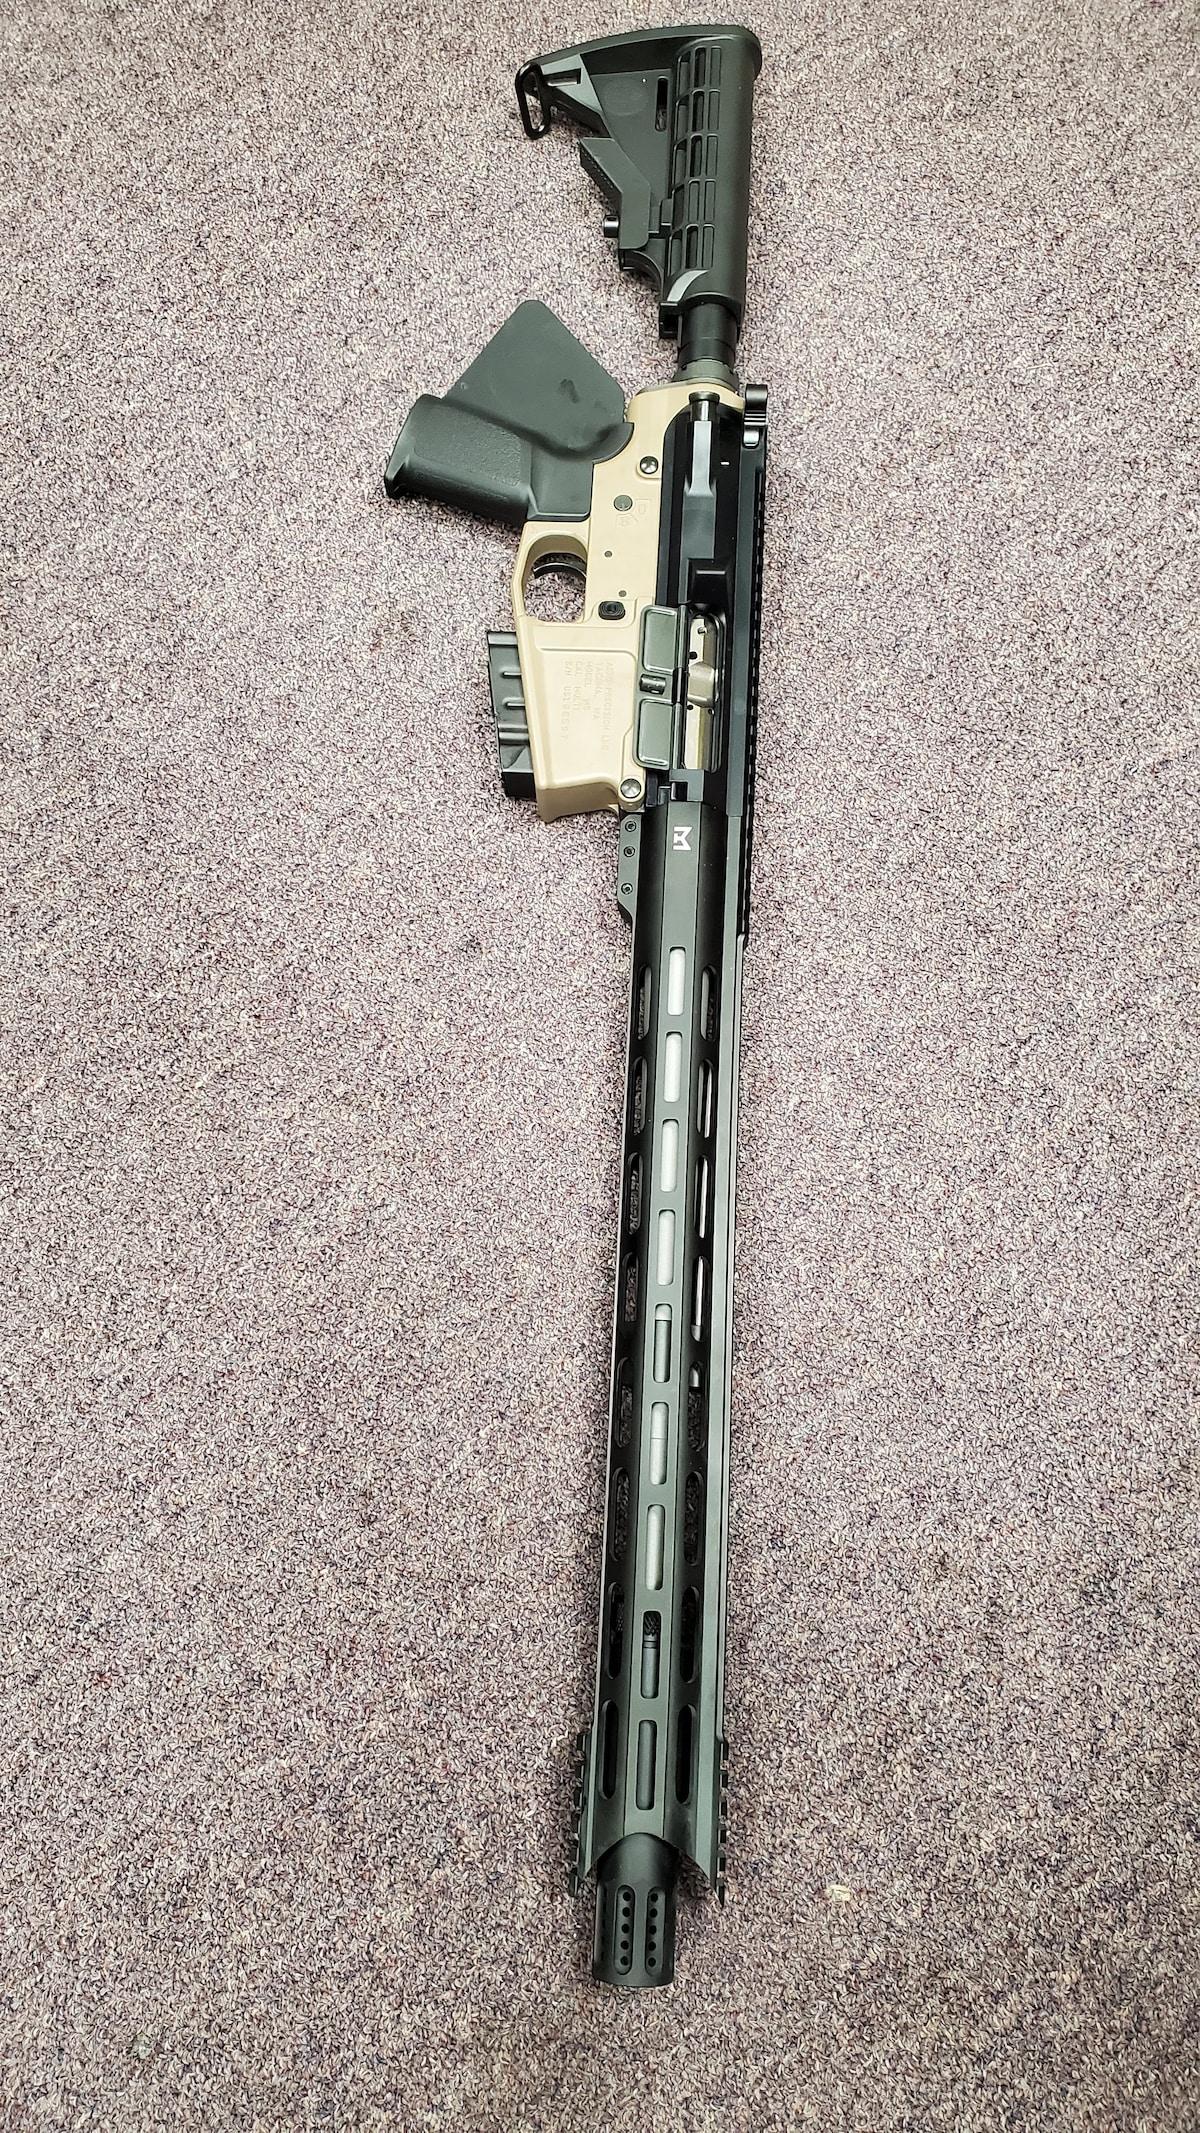 AERO PRECISION Special Edition Featureless AR-10 308 AR M5 with 10 rd magazine